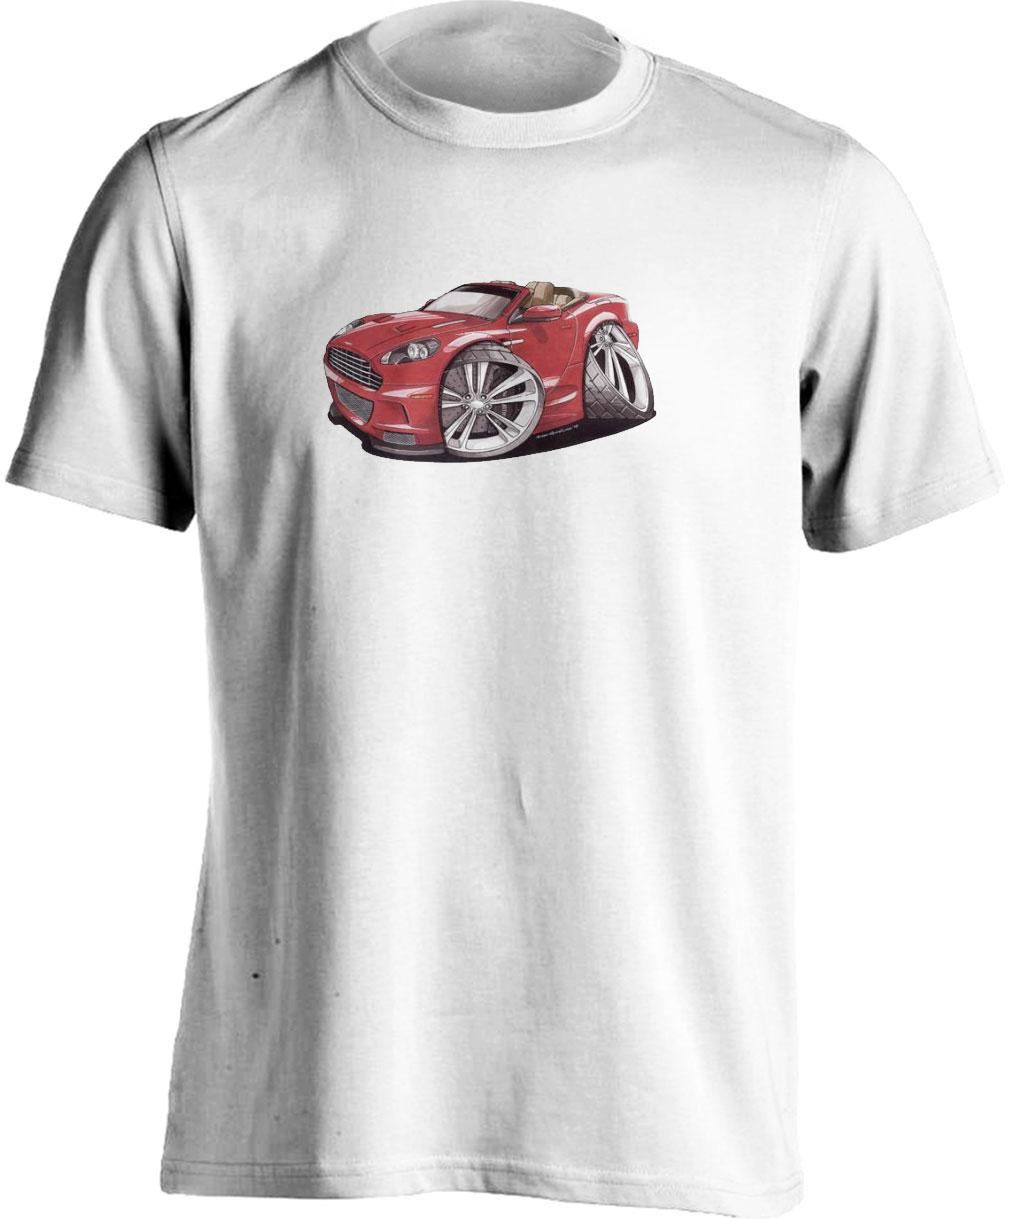 Koolart Aston Martin Volante Red 2893 Child's T Shirt